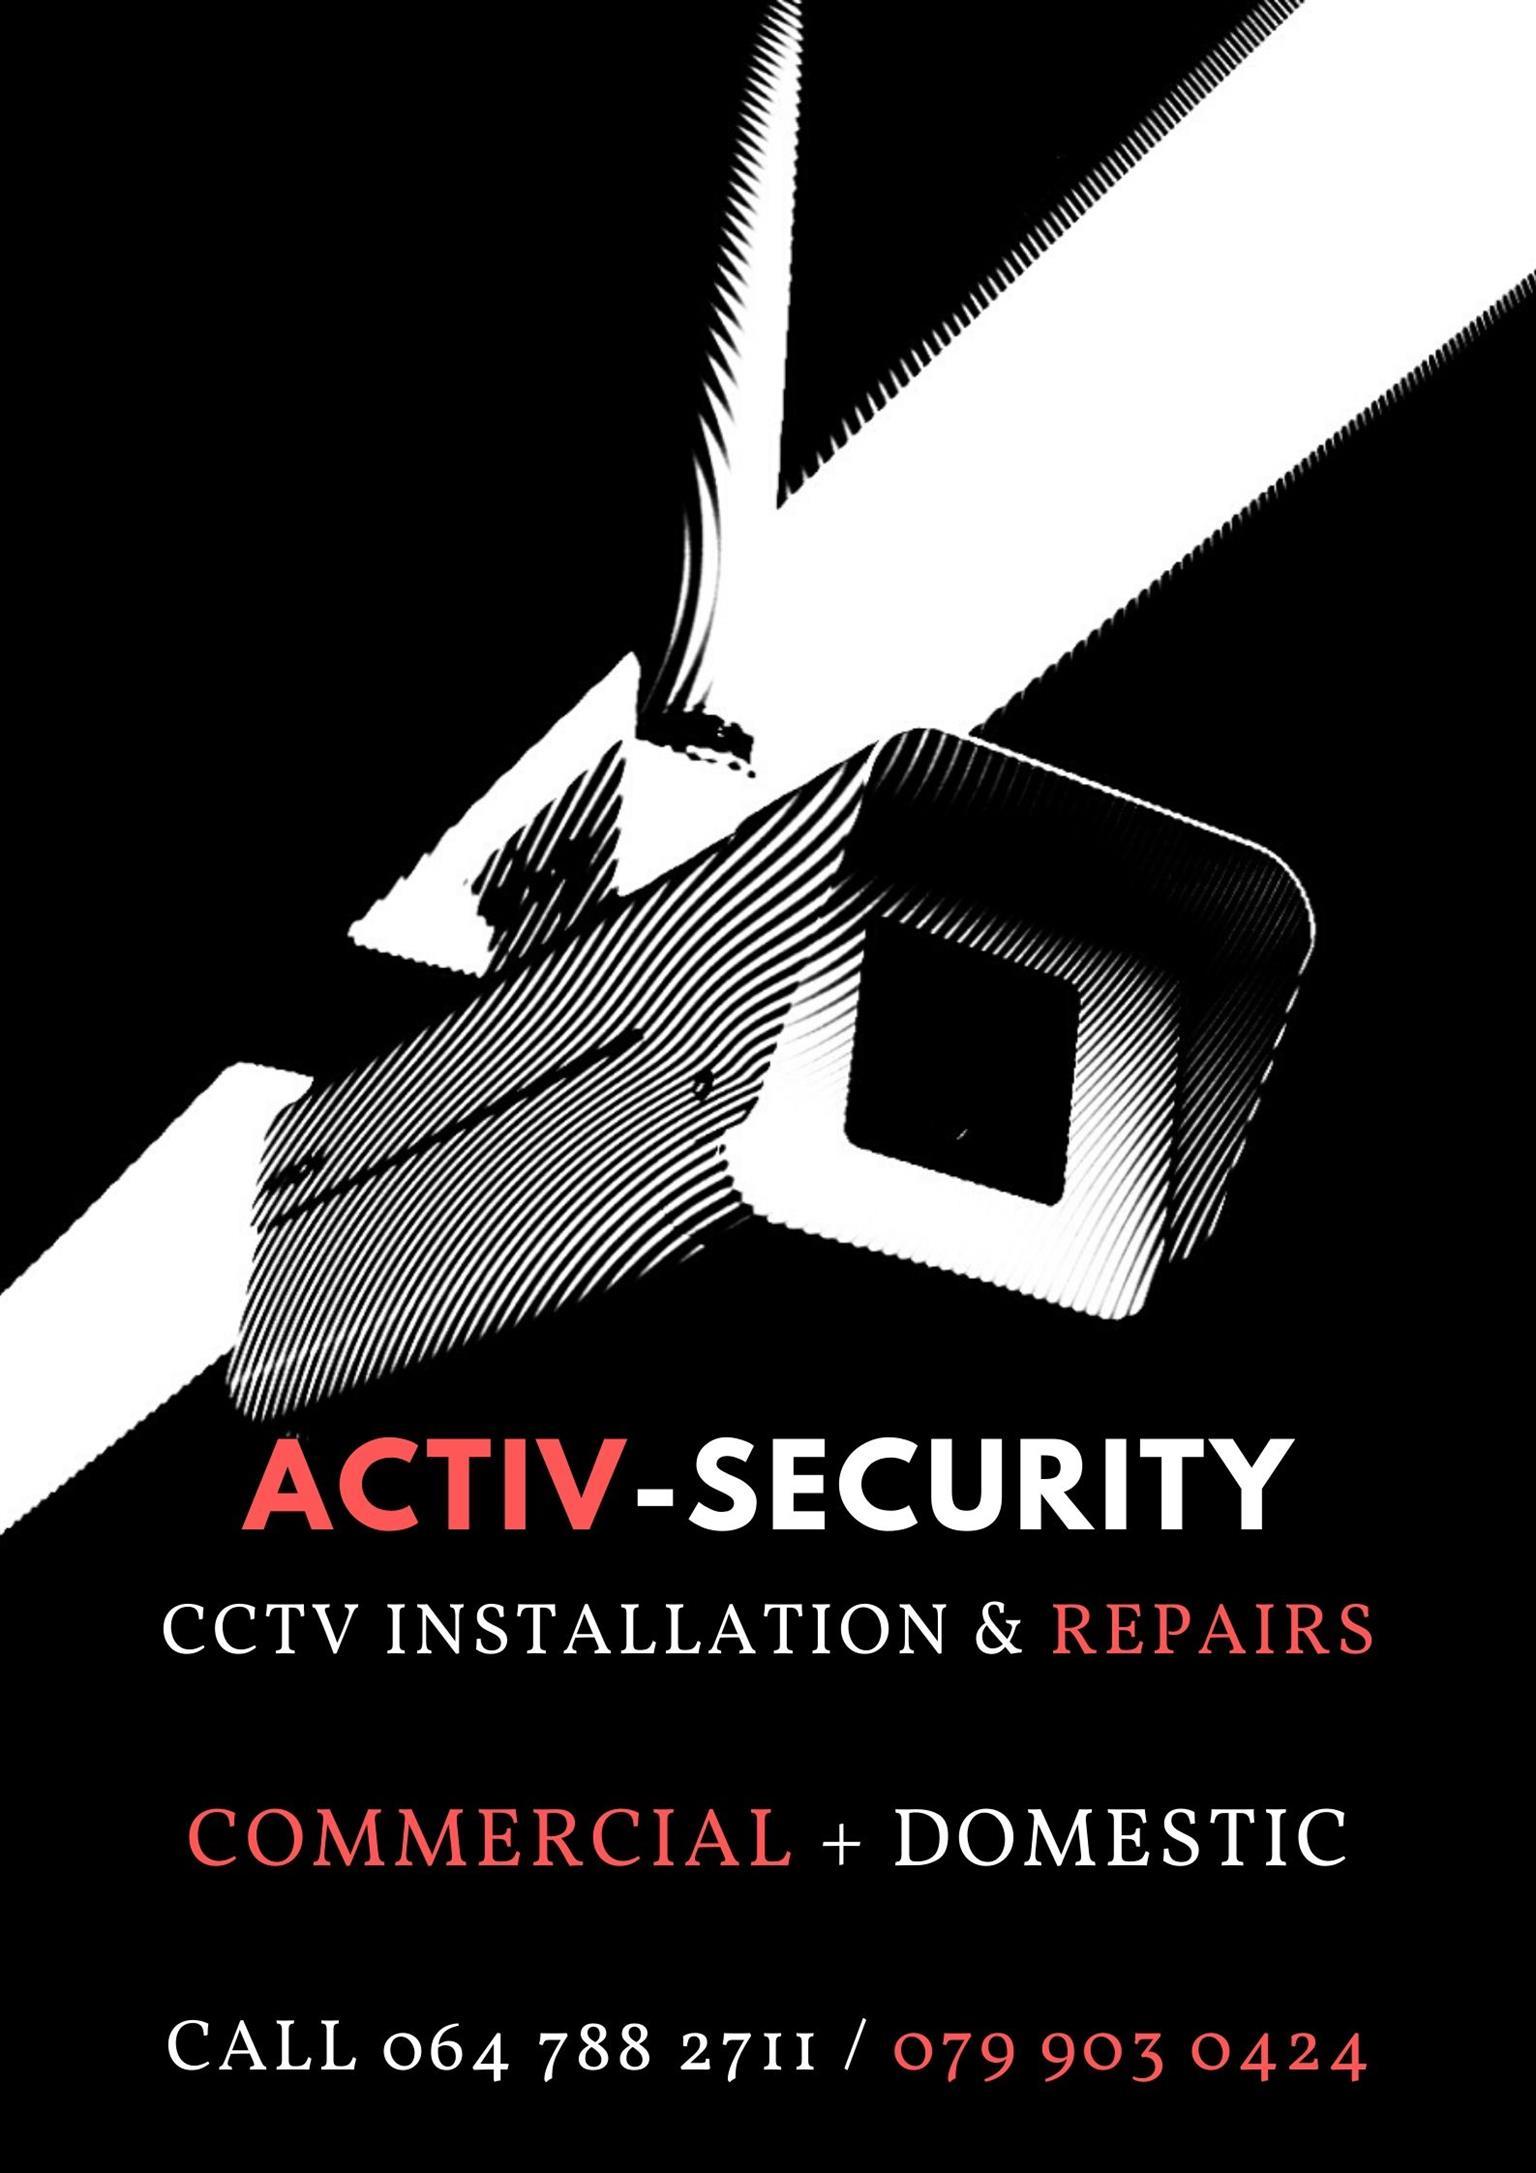 CCTV Installation & Maintenence